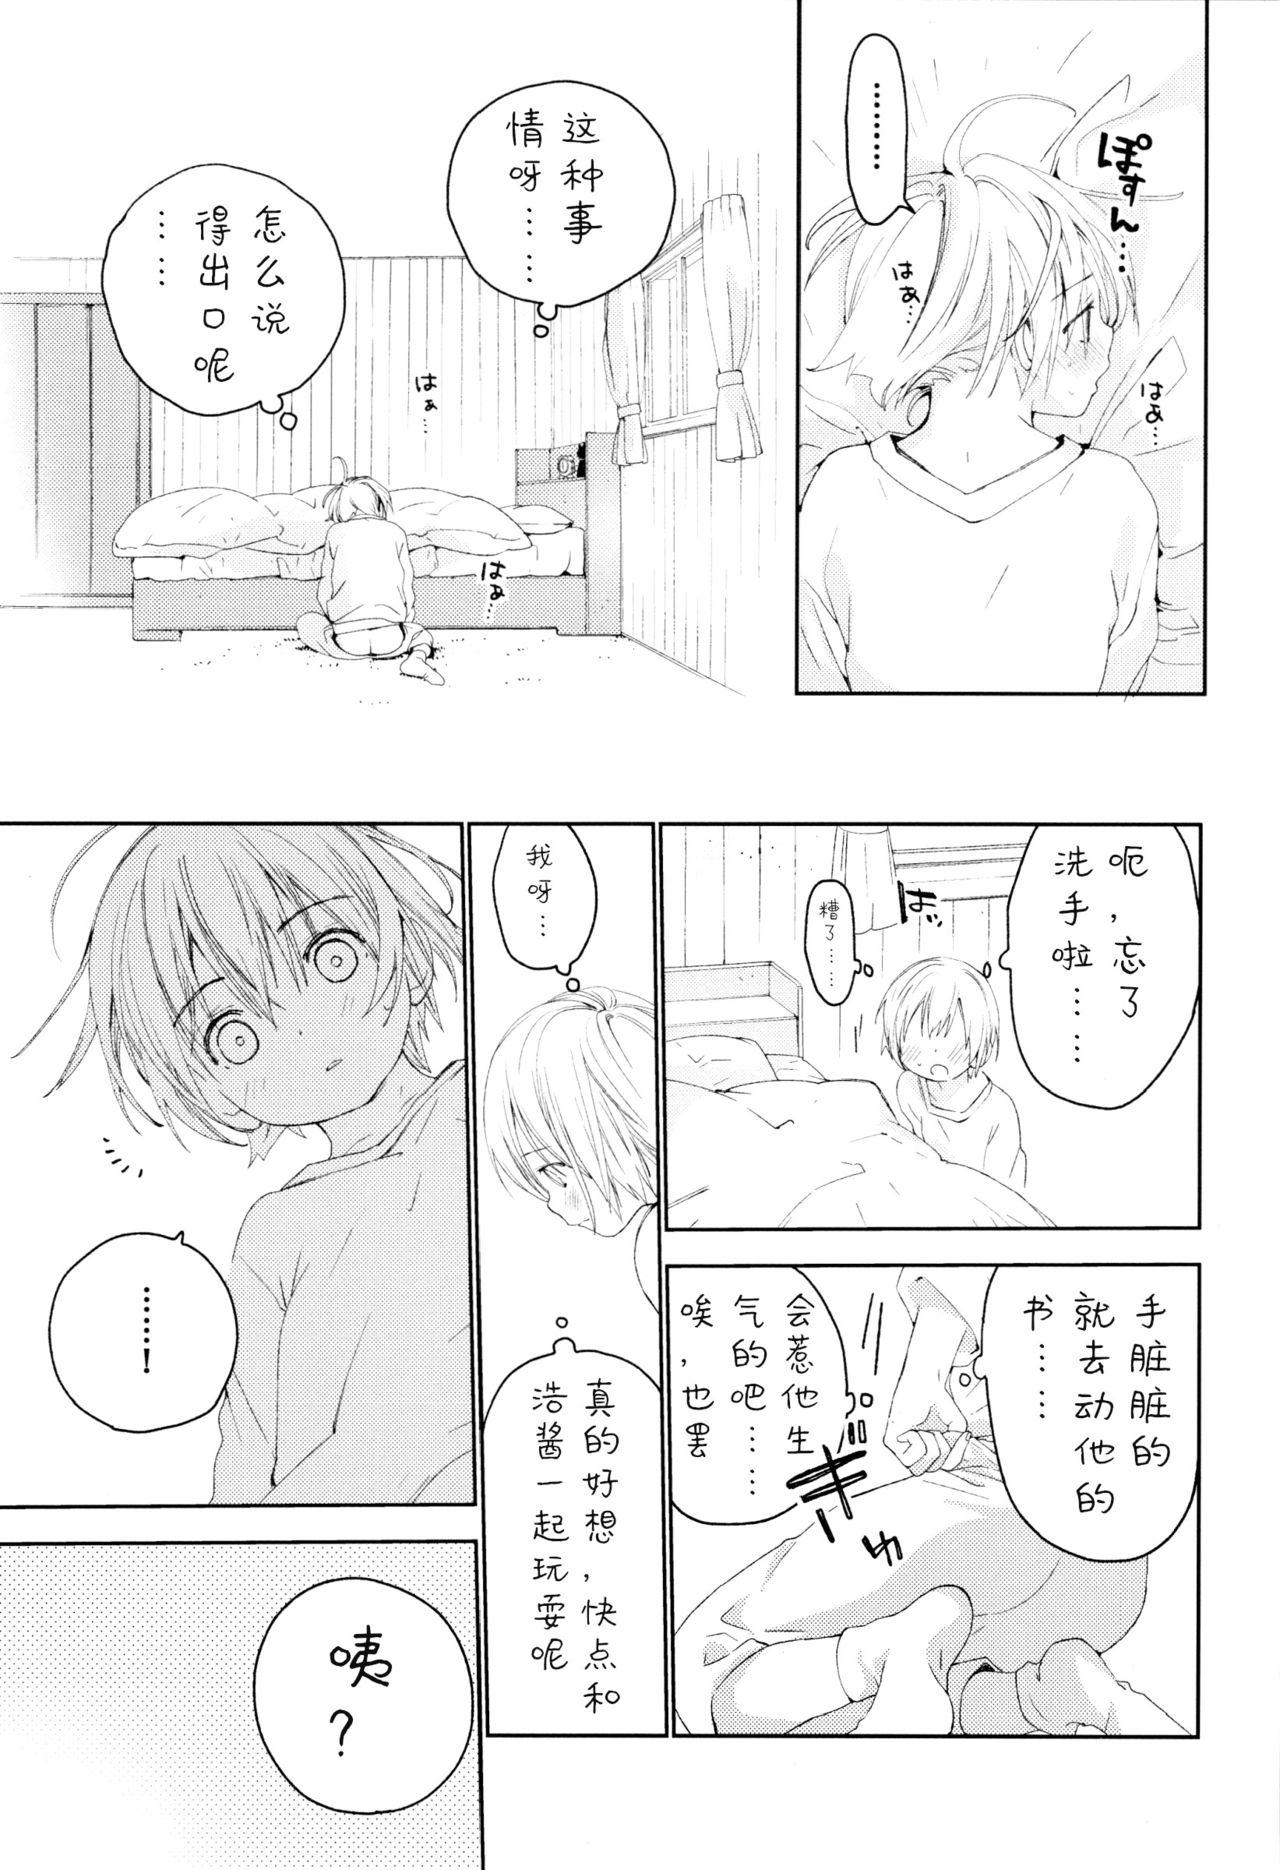 Osananajimi | 青梅竹马 17